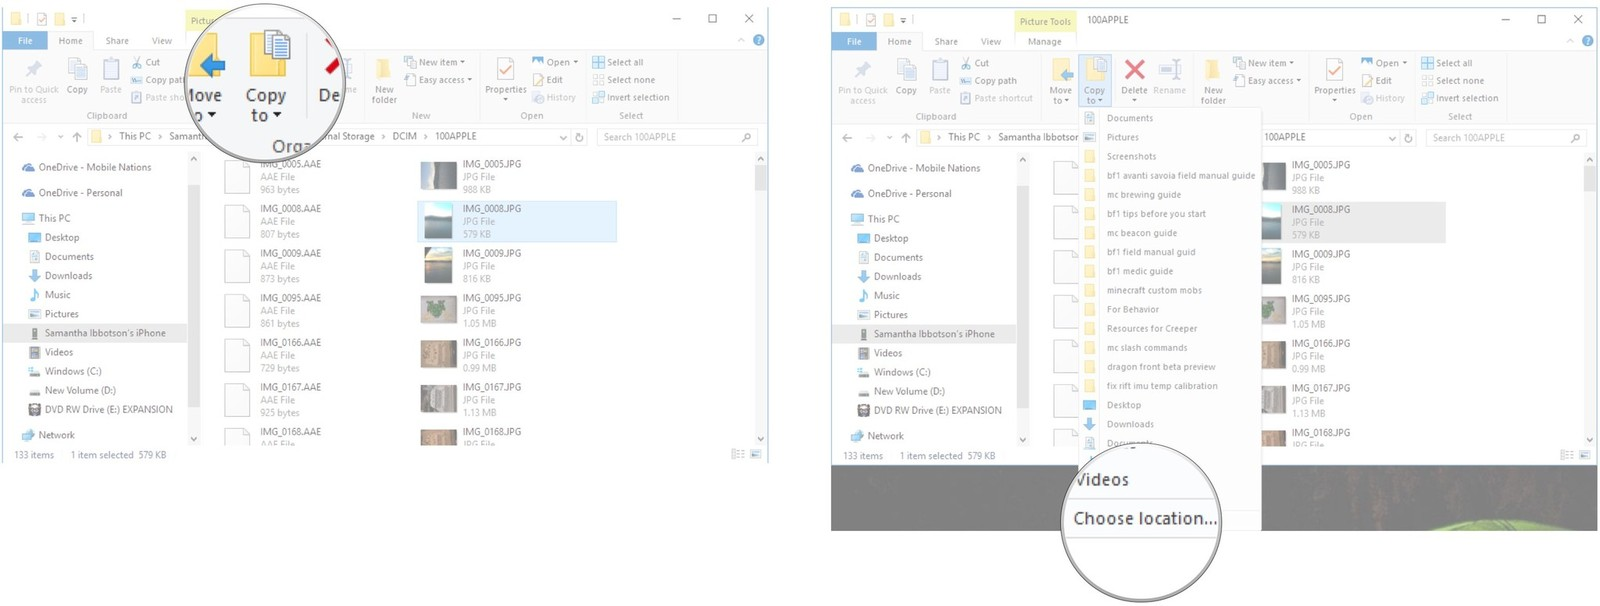 kak-perenesti-fotografii-s-iphone-i-ipad-na-kompyuter-s-windows-10-fajjlovyjj-menedzher-4